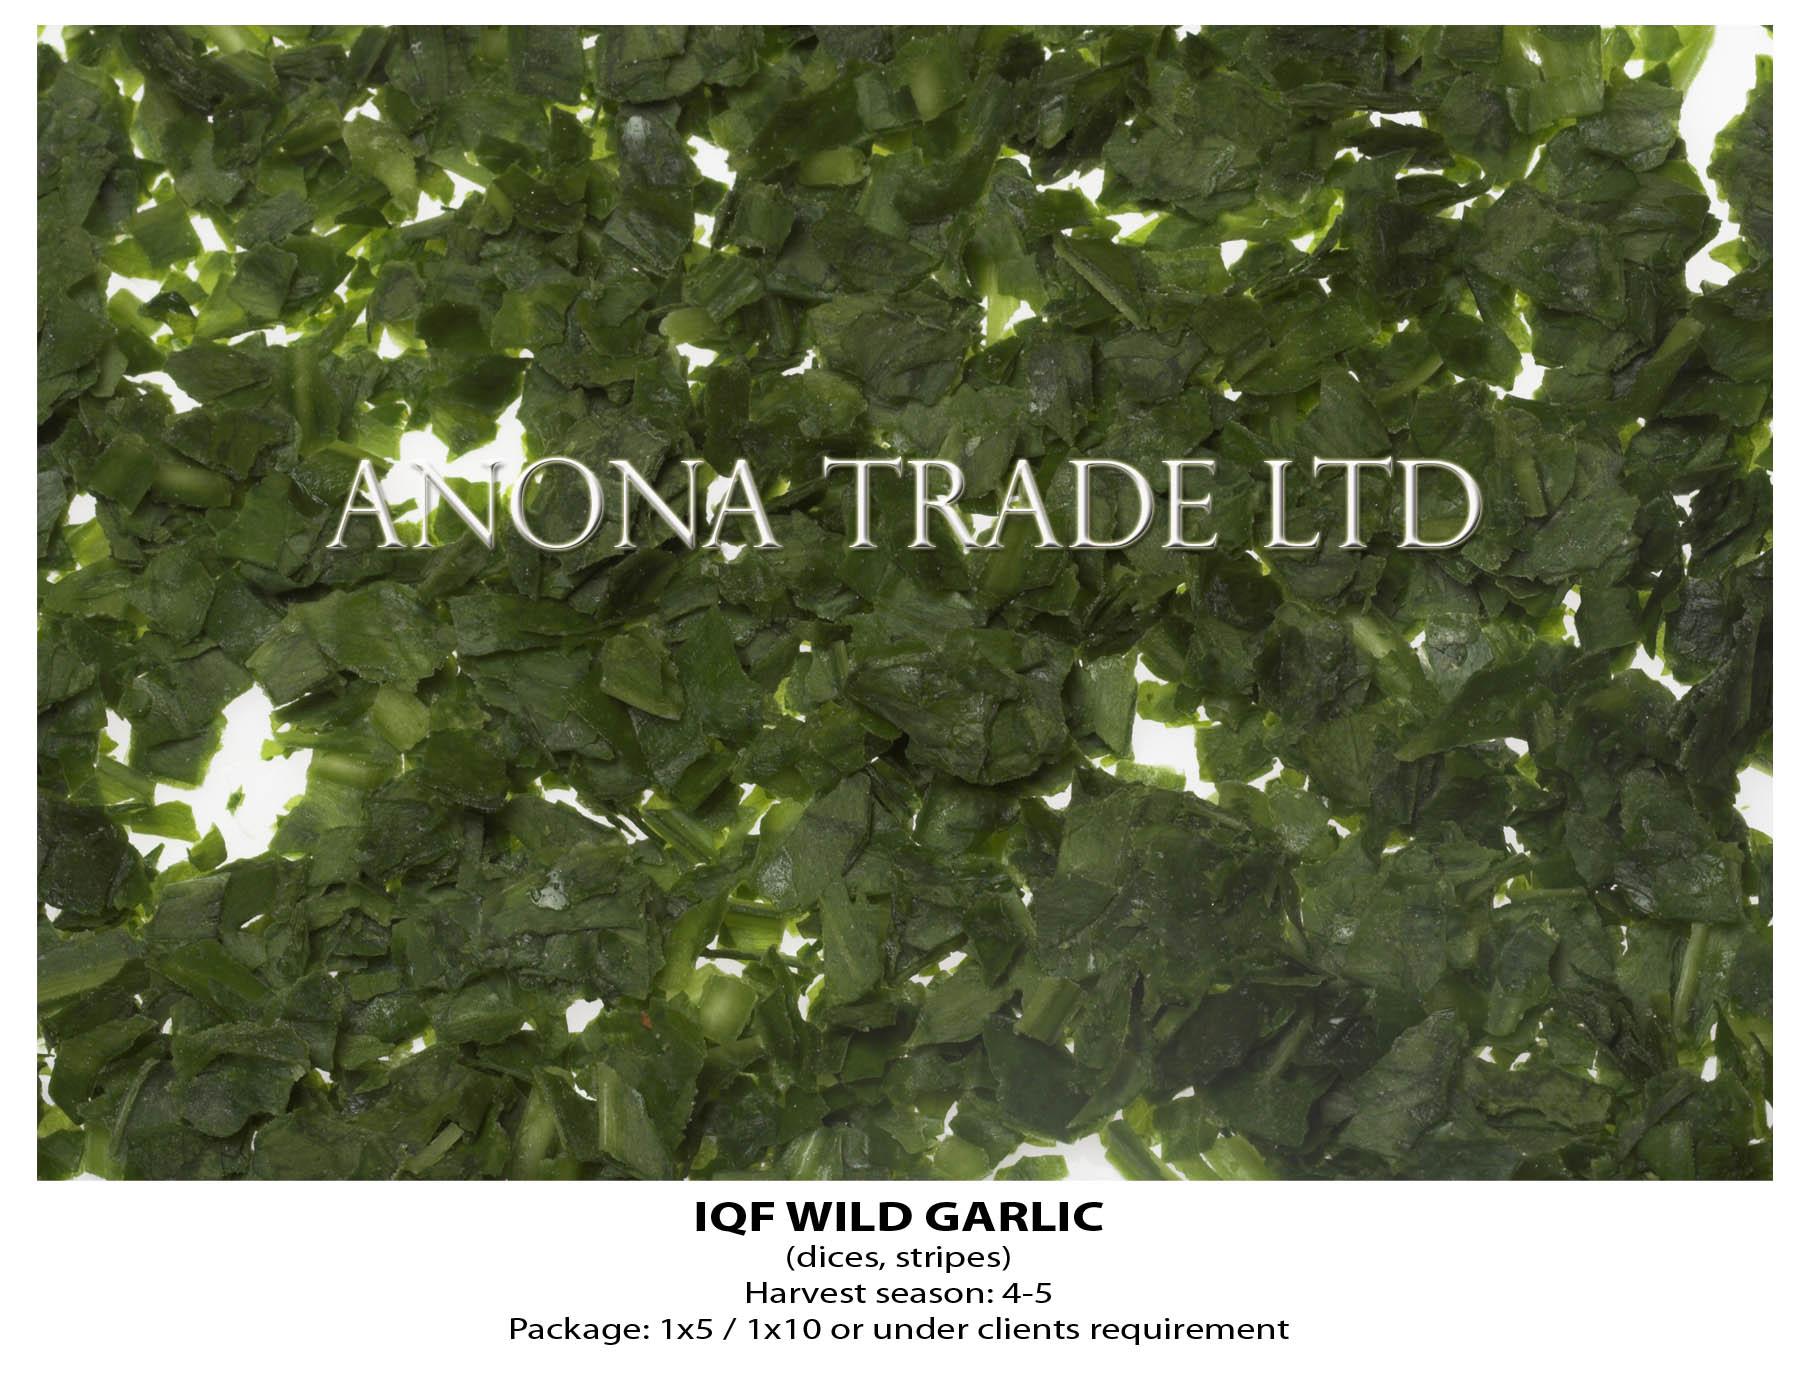 Anona Trade Ltd  - Invest Bulgaria.com